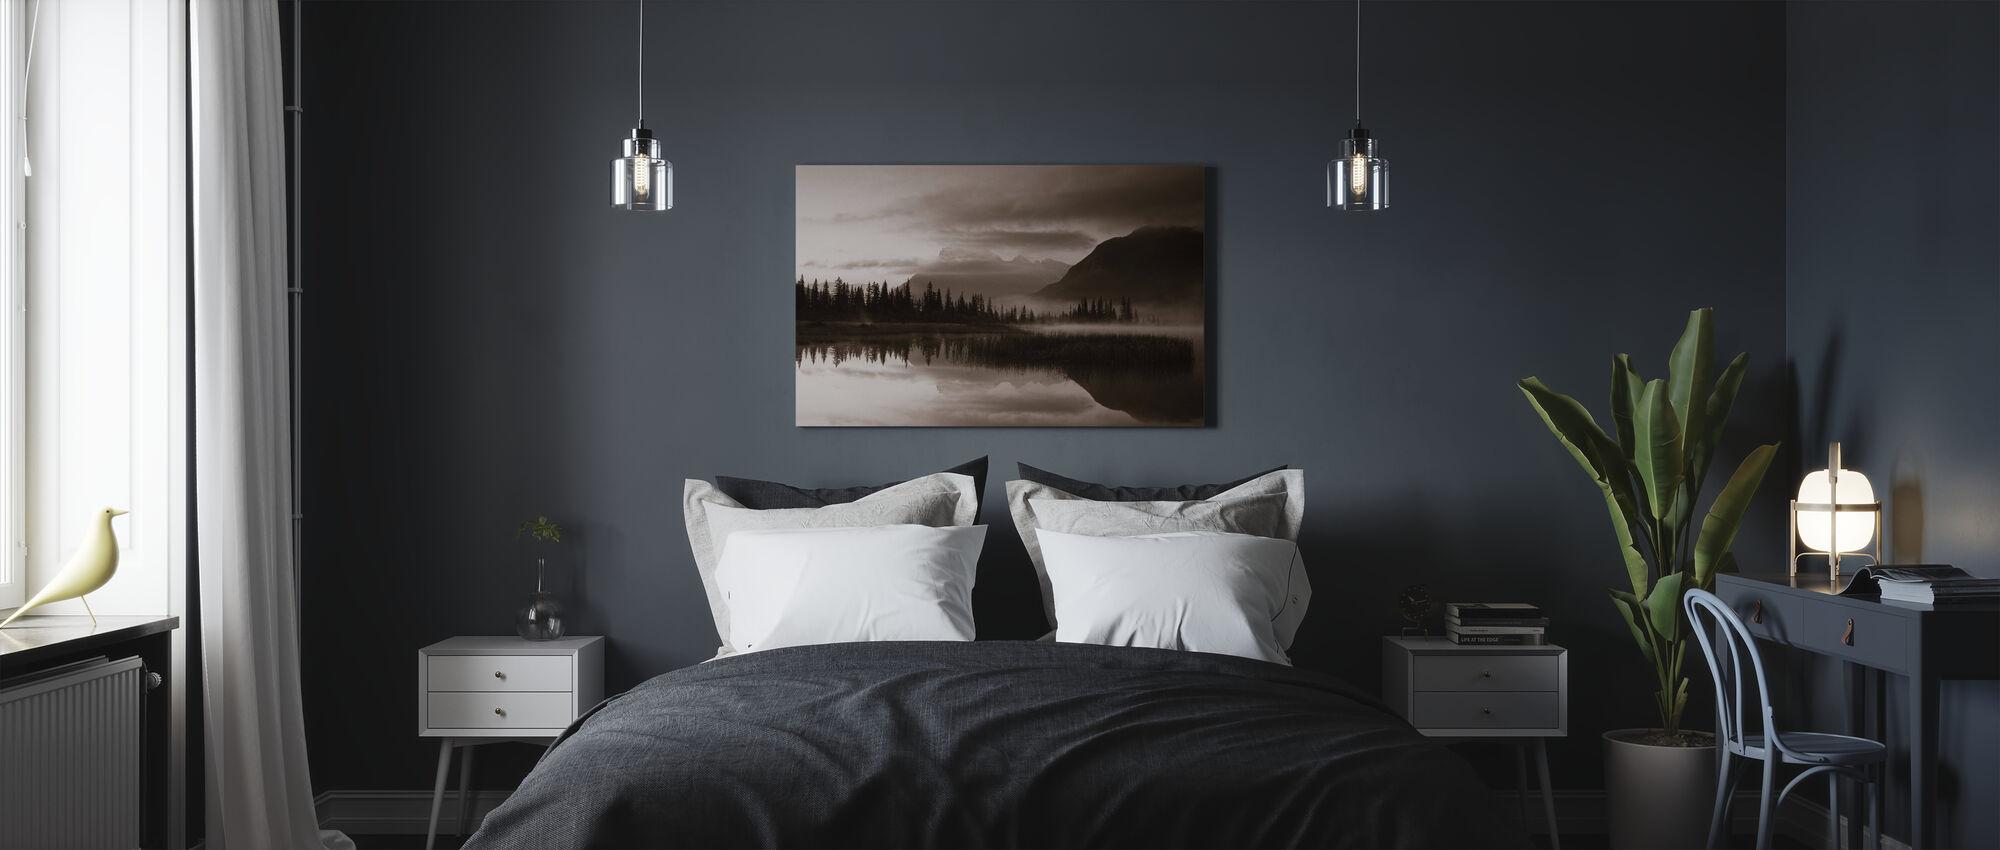 Reflectie - Sepia - Canvas print - Slaapkamer